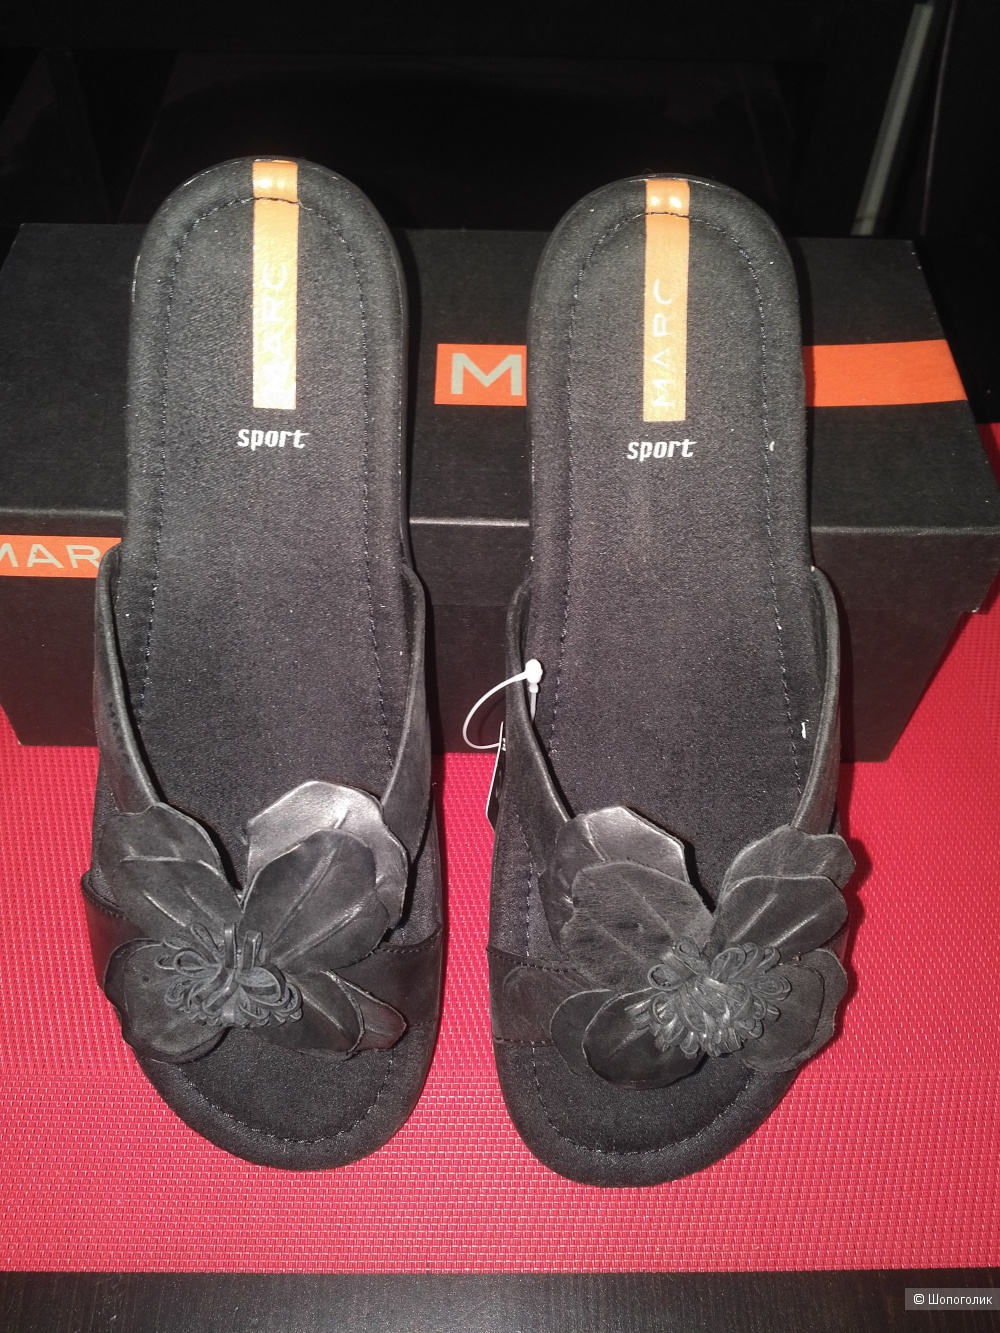 Шлепанцы женские бренда Мarc, размер 39